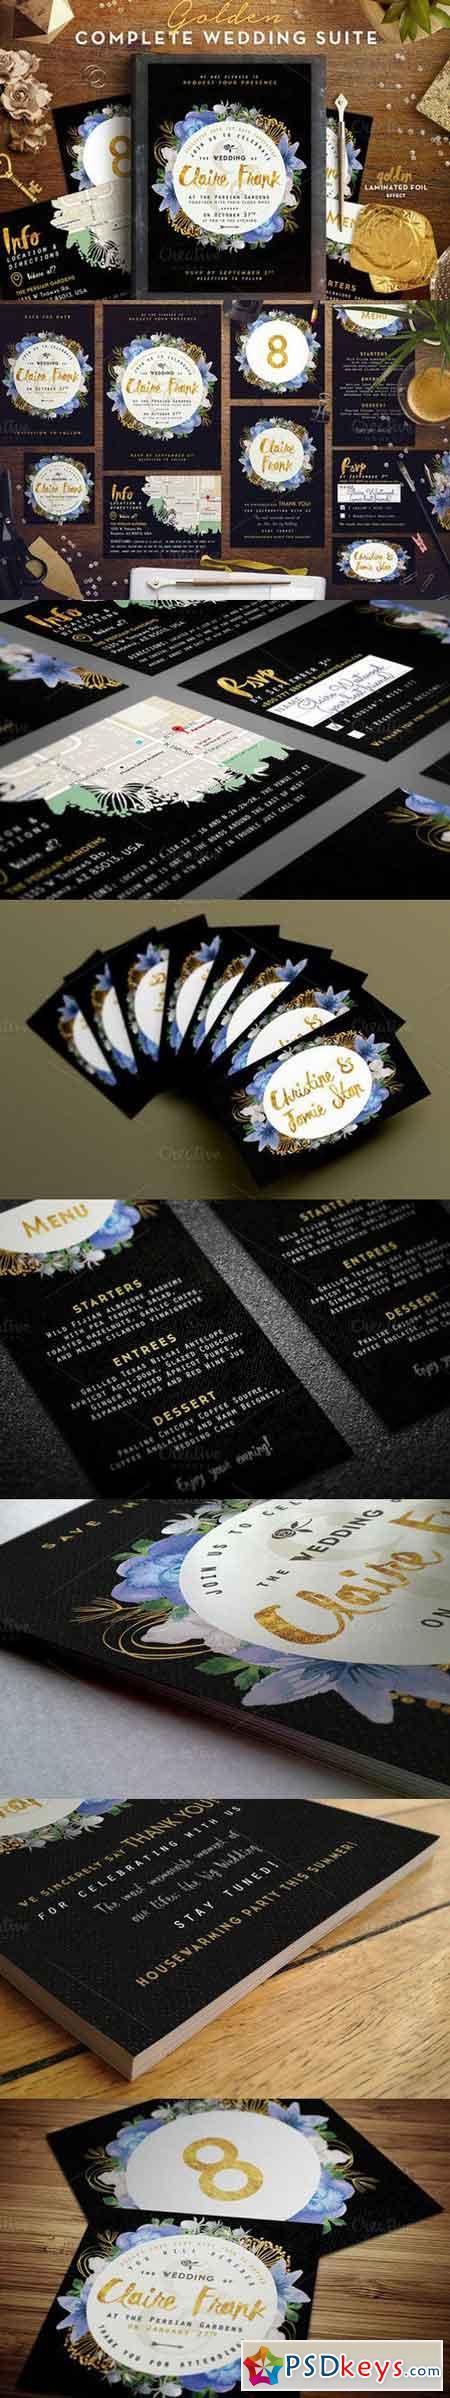 Wedding Suite VIII - Golden Foil EDT 682100